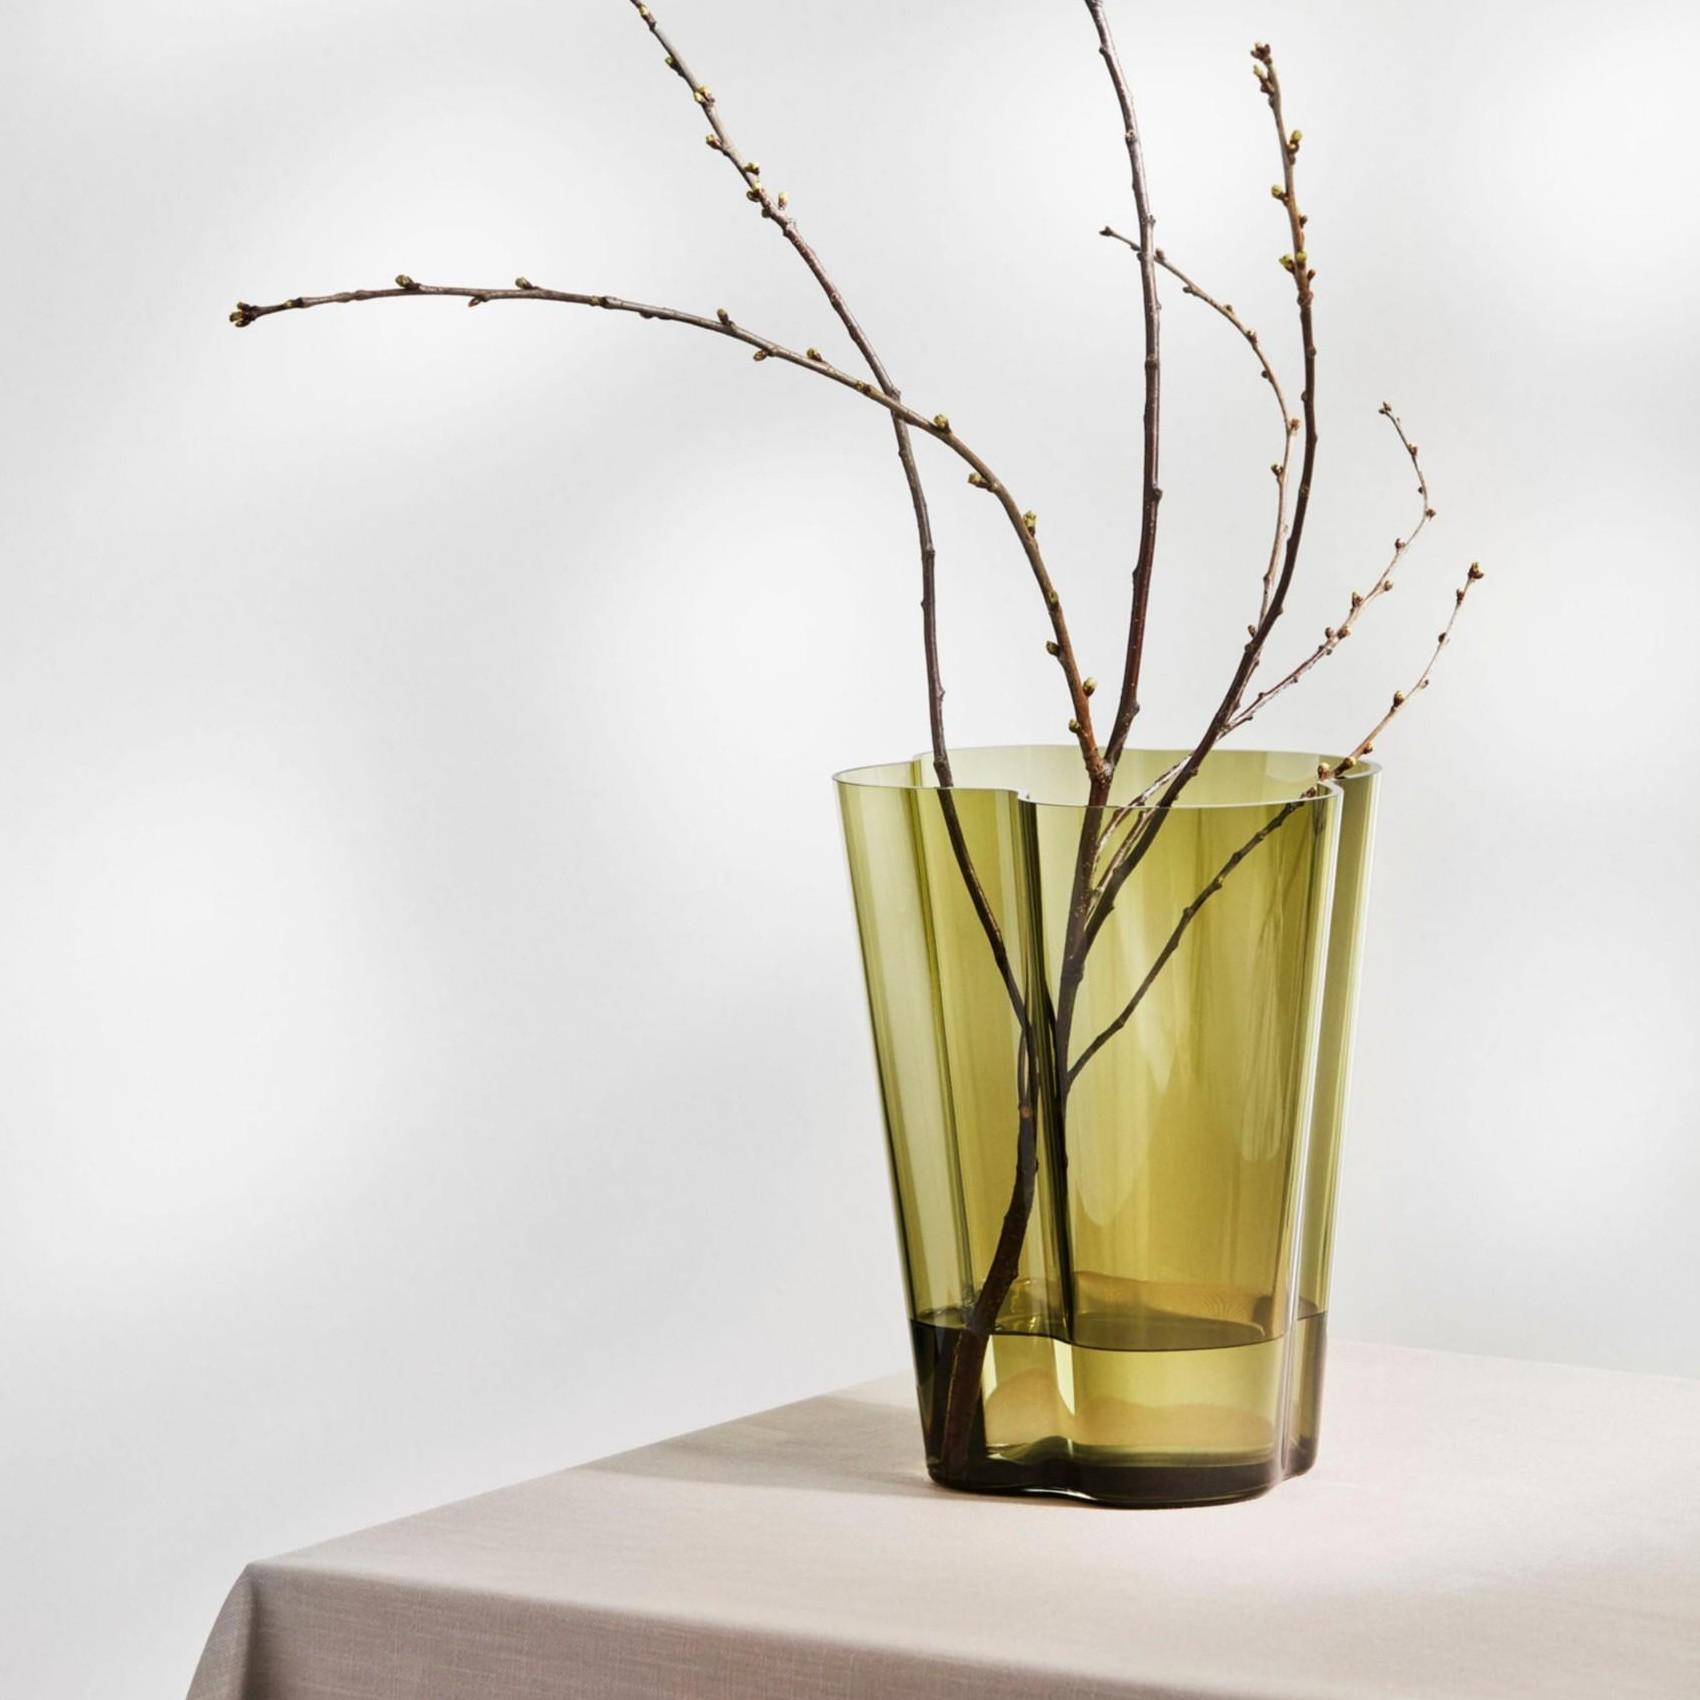 Iittala Alvar Aalto Vase 270mm Ambientedirect